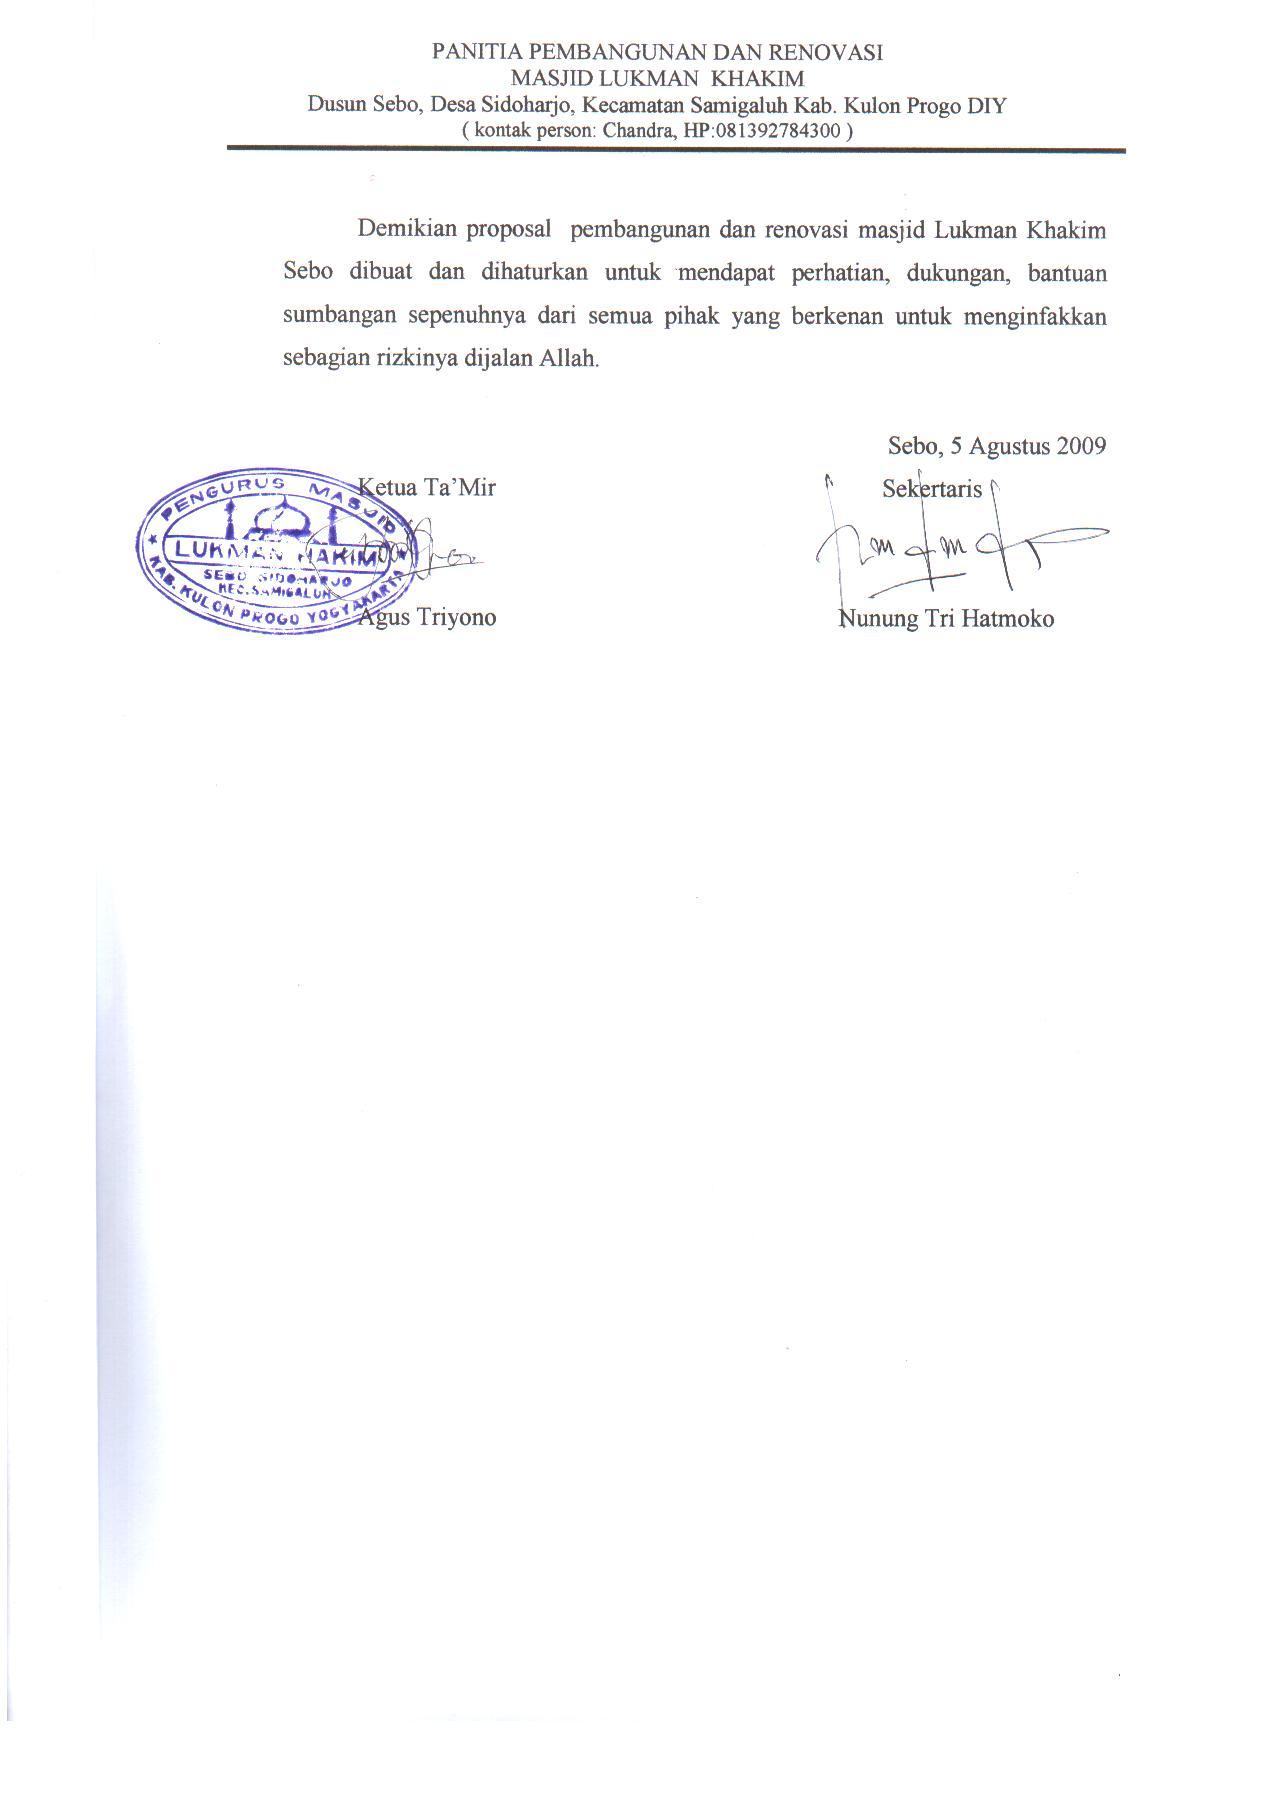 Penutup Proposal Pembangunan dan Renovasi Masjid Lukman Khakim